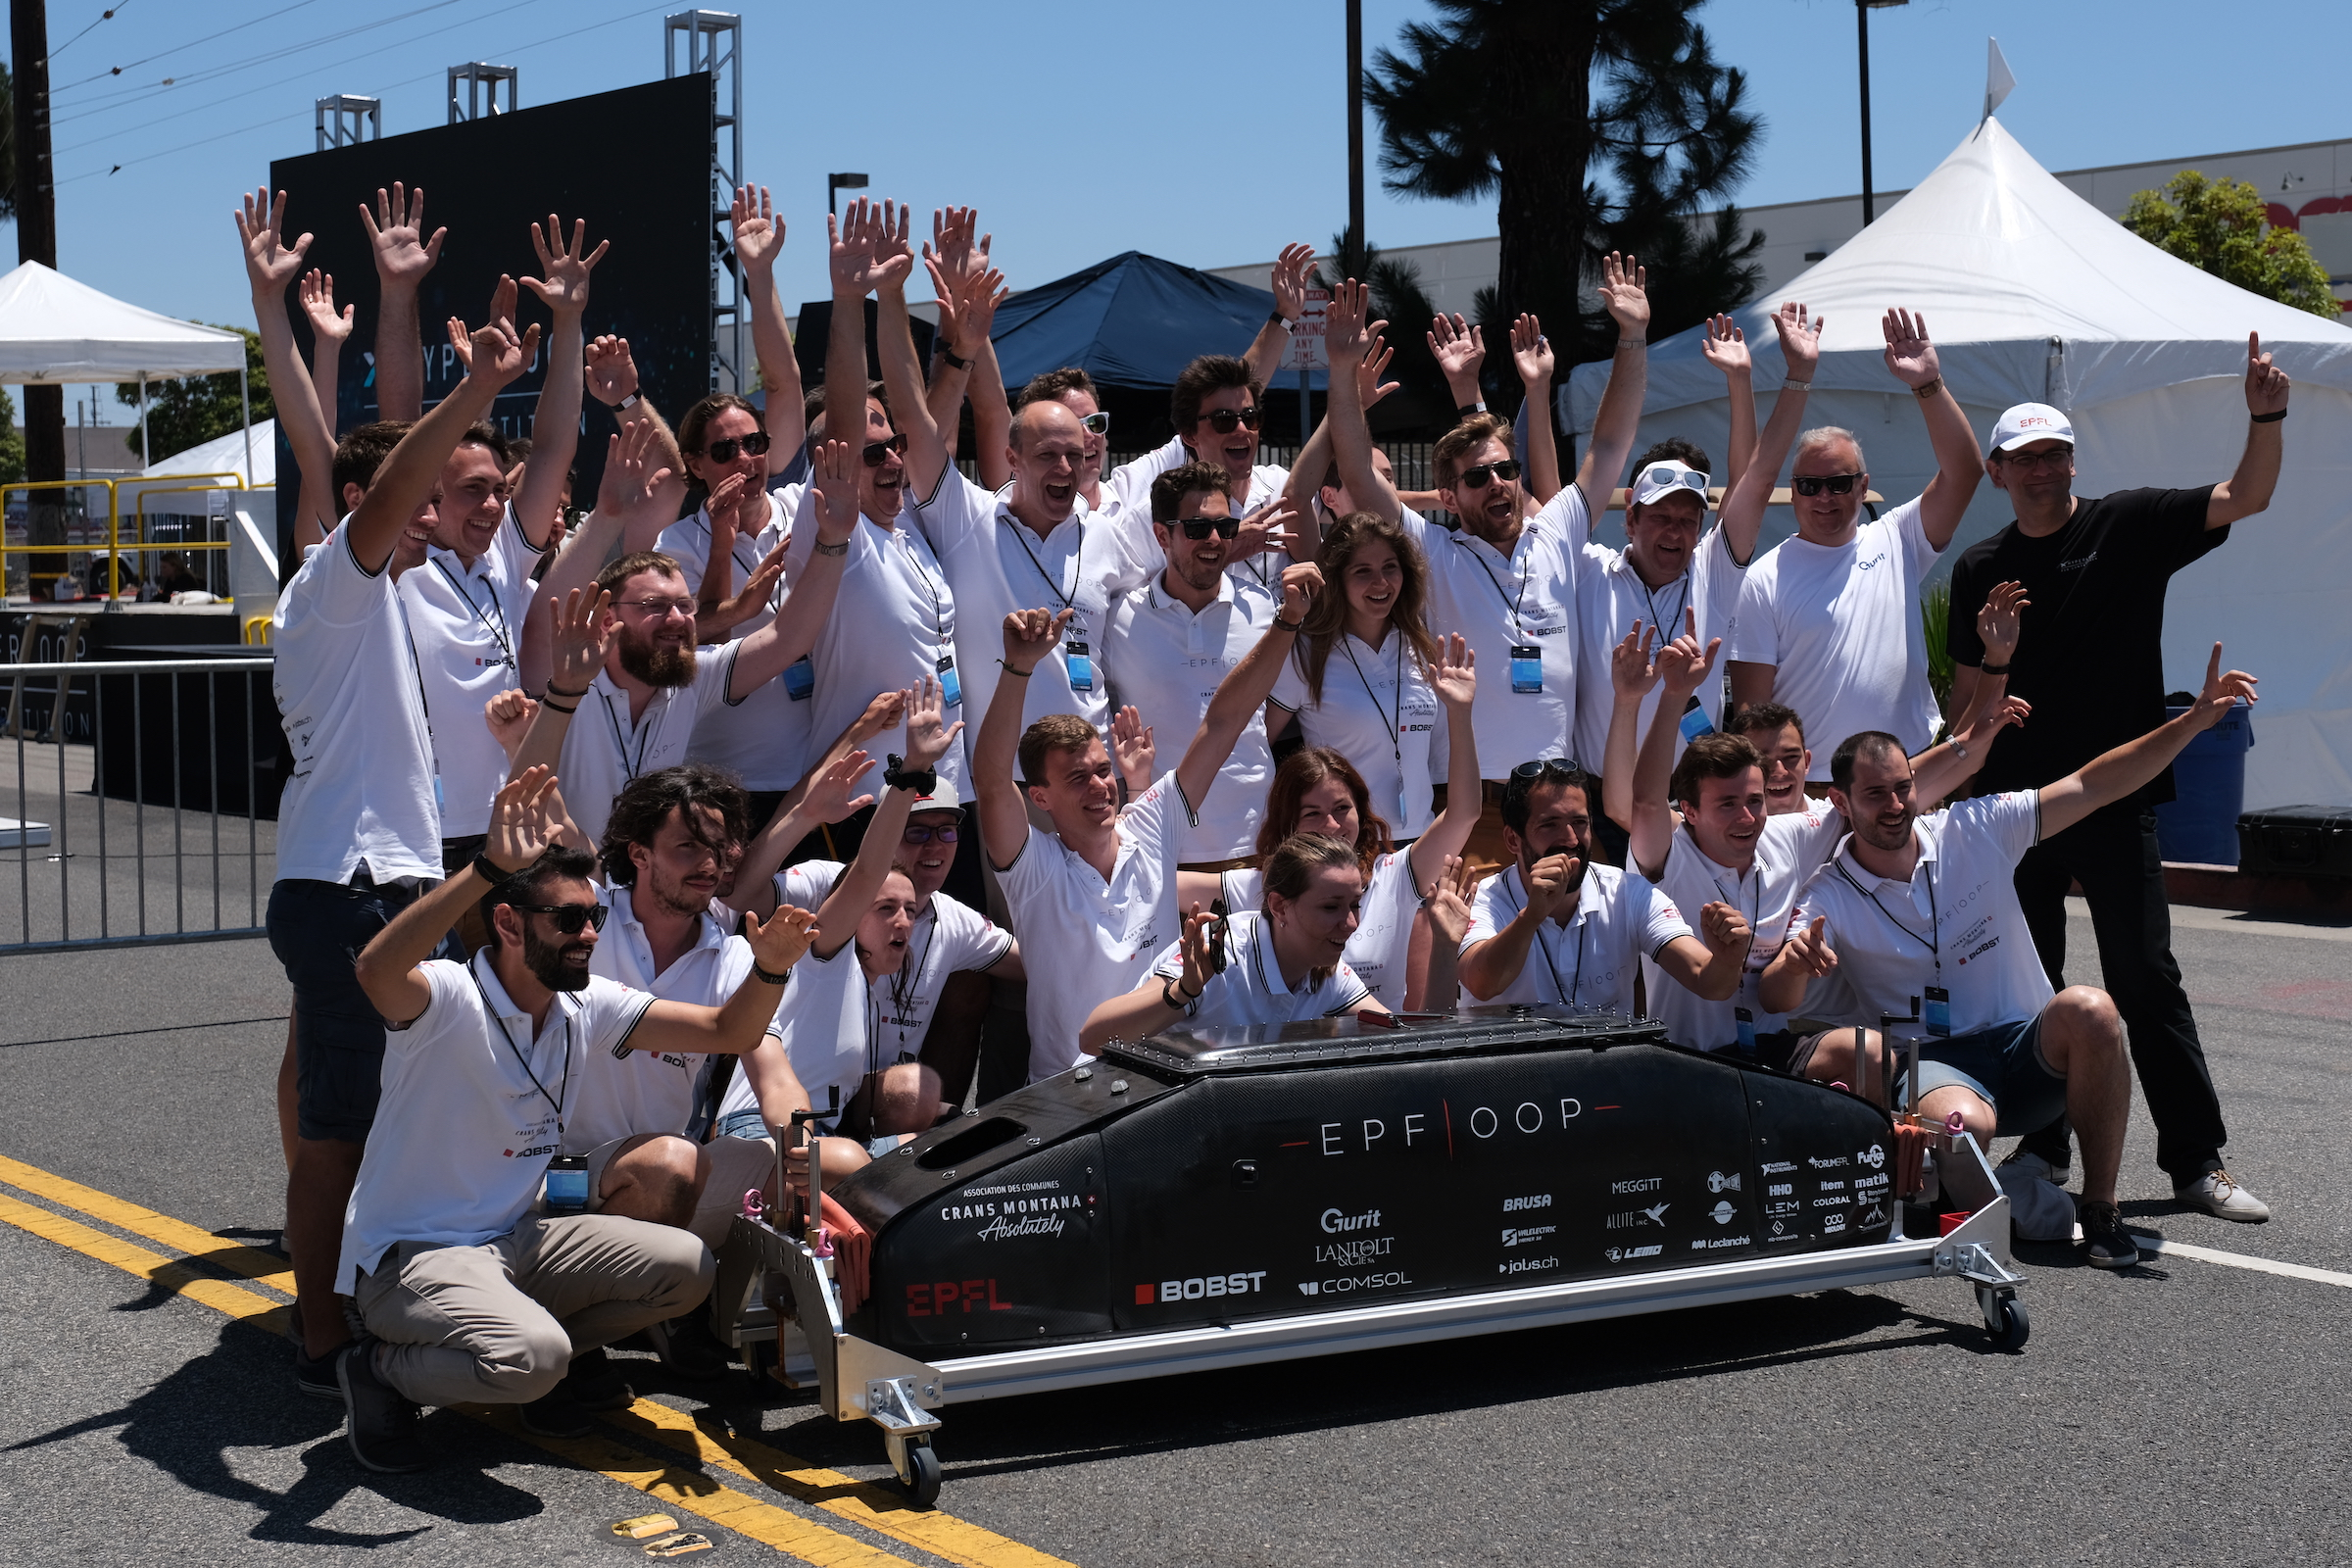 hyperloop pod competition epfl 1